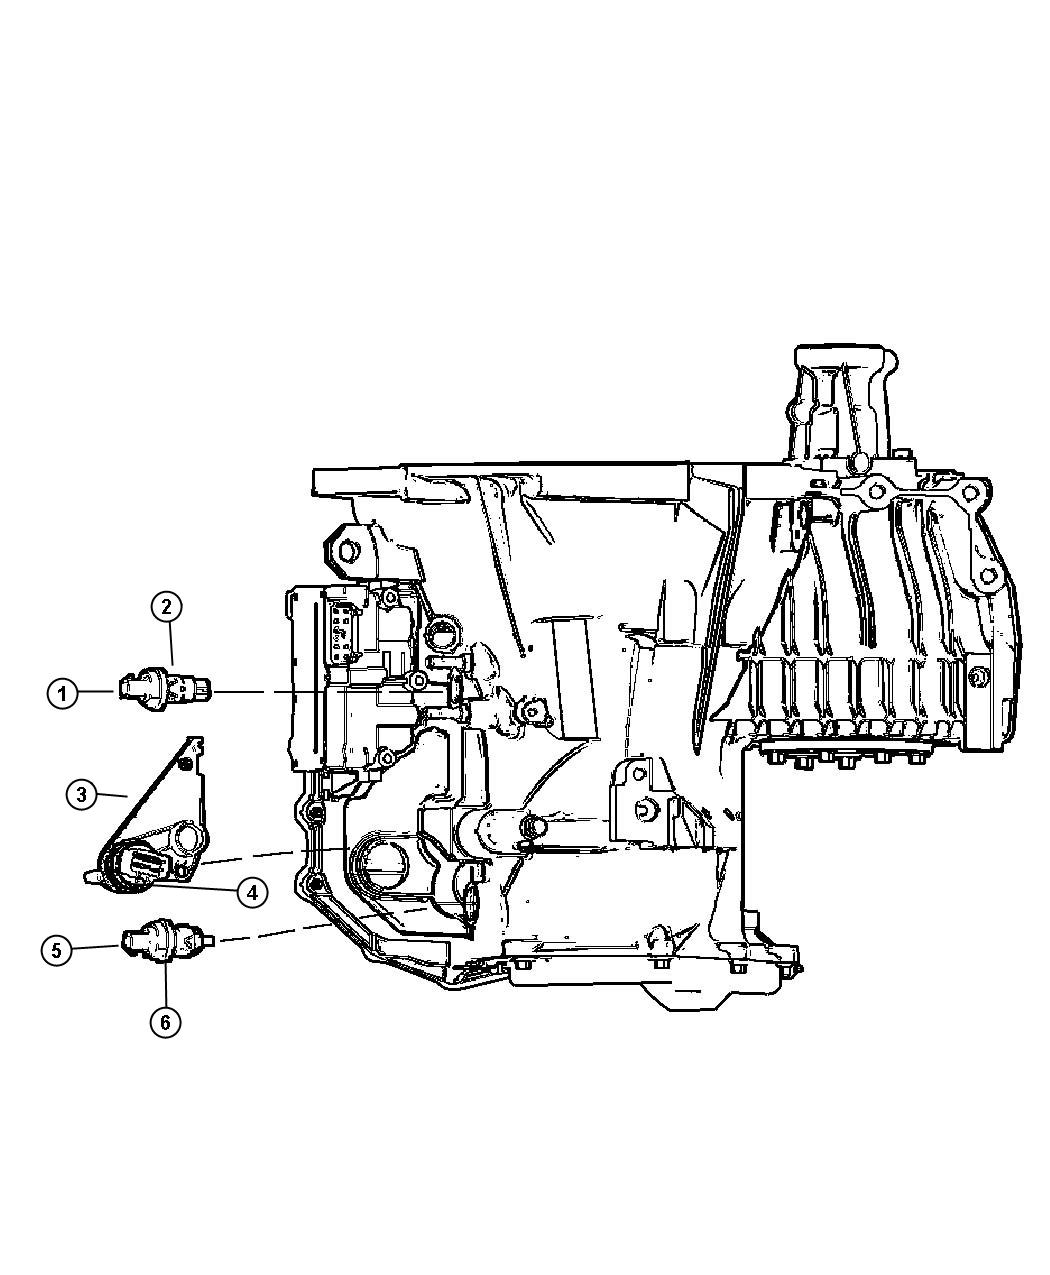 Wiring diagram 2010 dodge dakota req radio